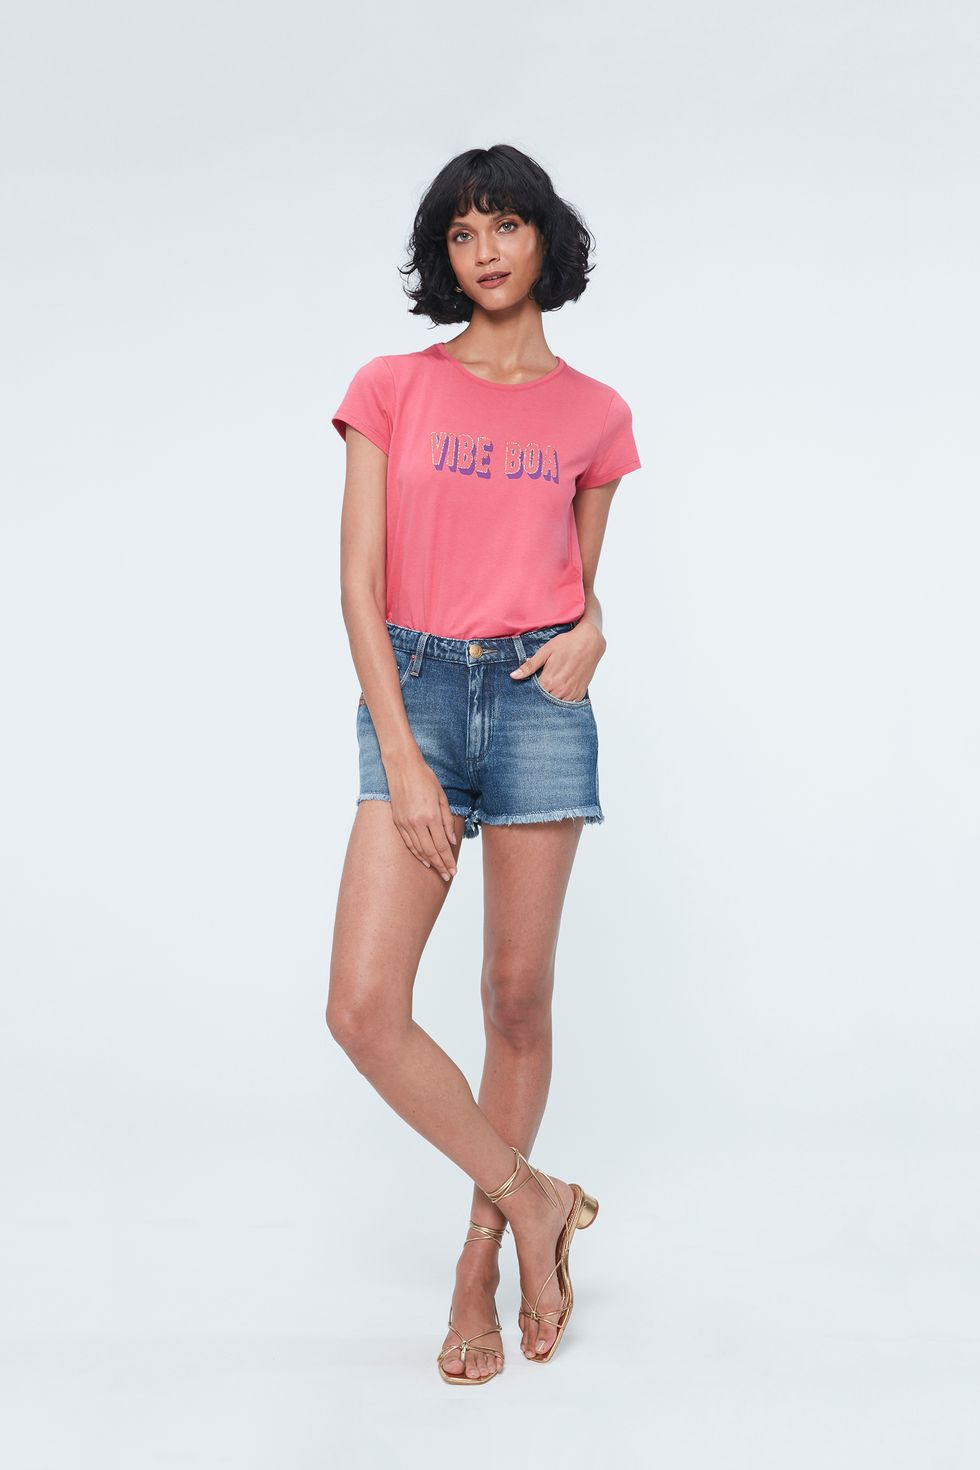 Look-Camiseta-com-Estampa-Vibe-Boa